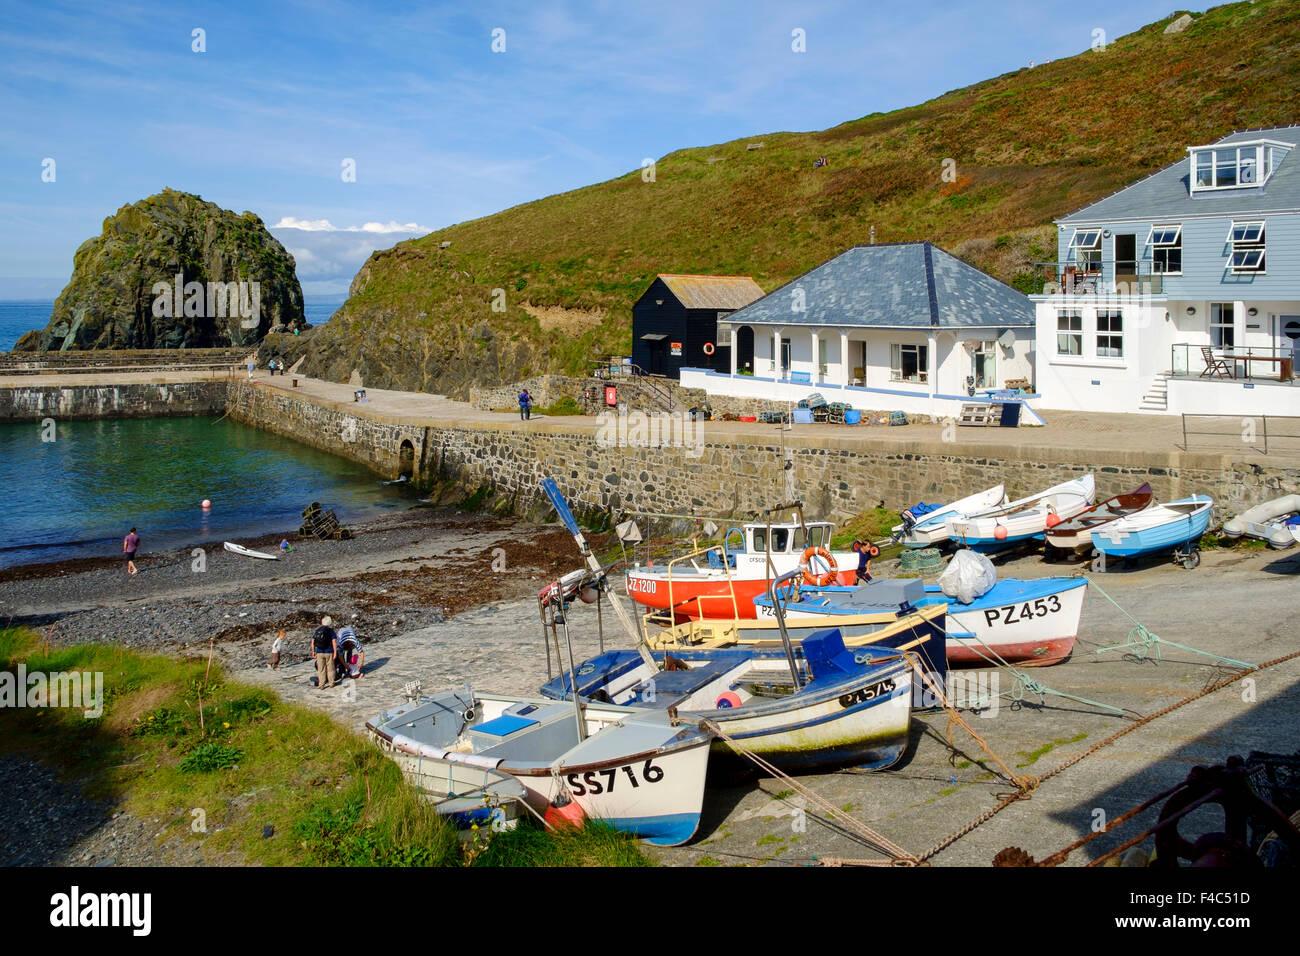 Mullion Cove with fishing boats, Mullion, The Lizard Peninsula, Cornwall, England, UK - Stock Image